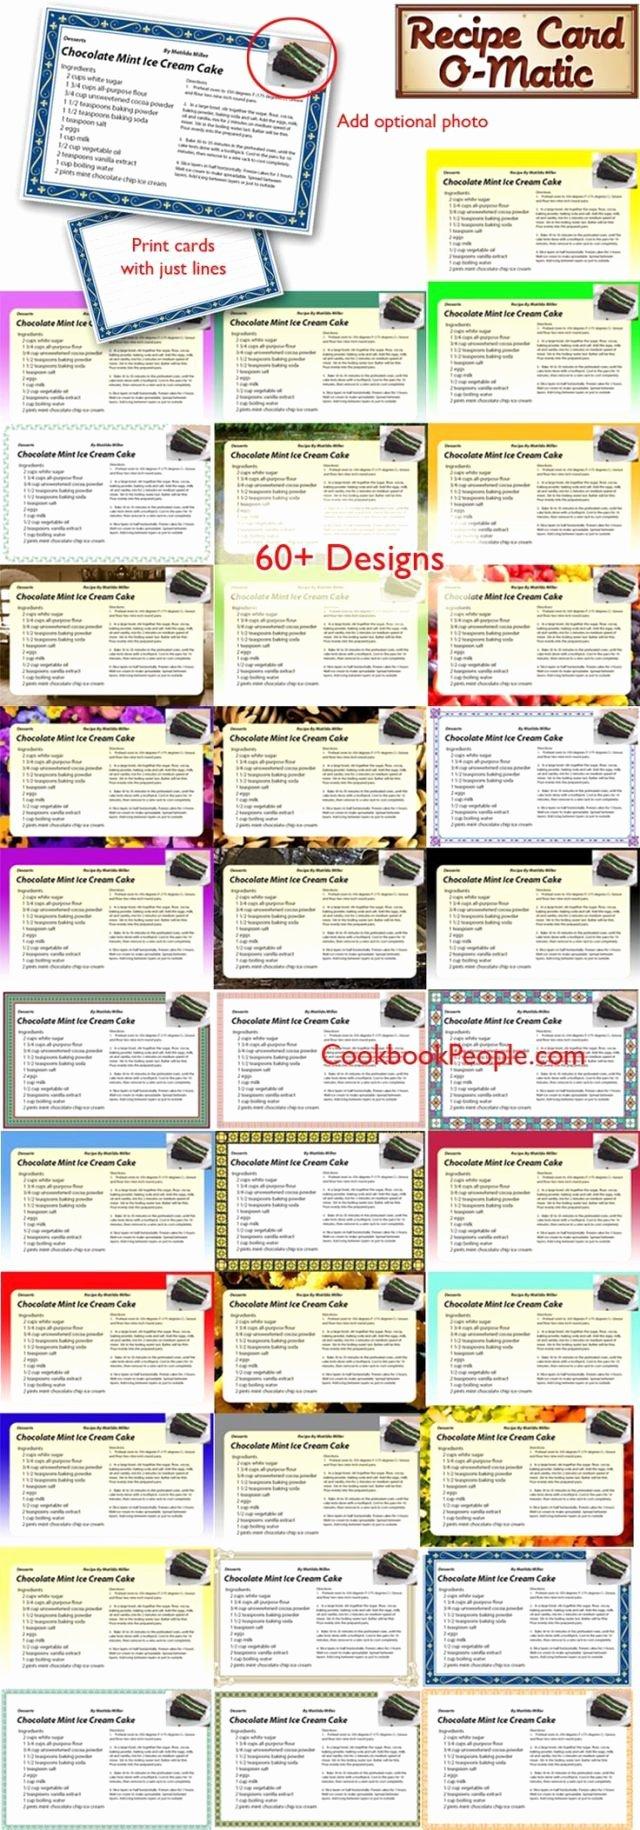 Recipe Template Microsoft Word Luxury Free Editable Recipe Card Templates for Microsoft Word